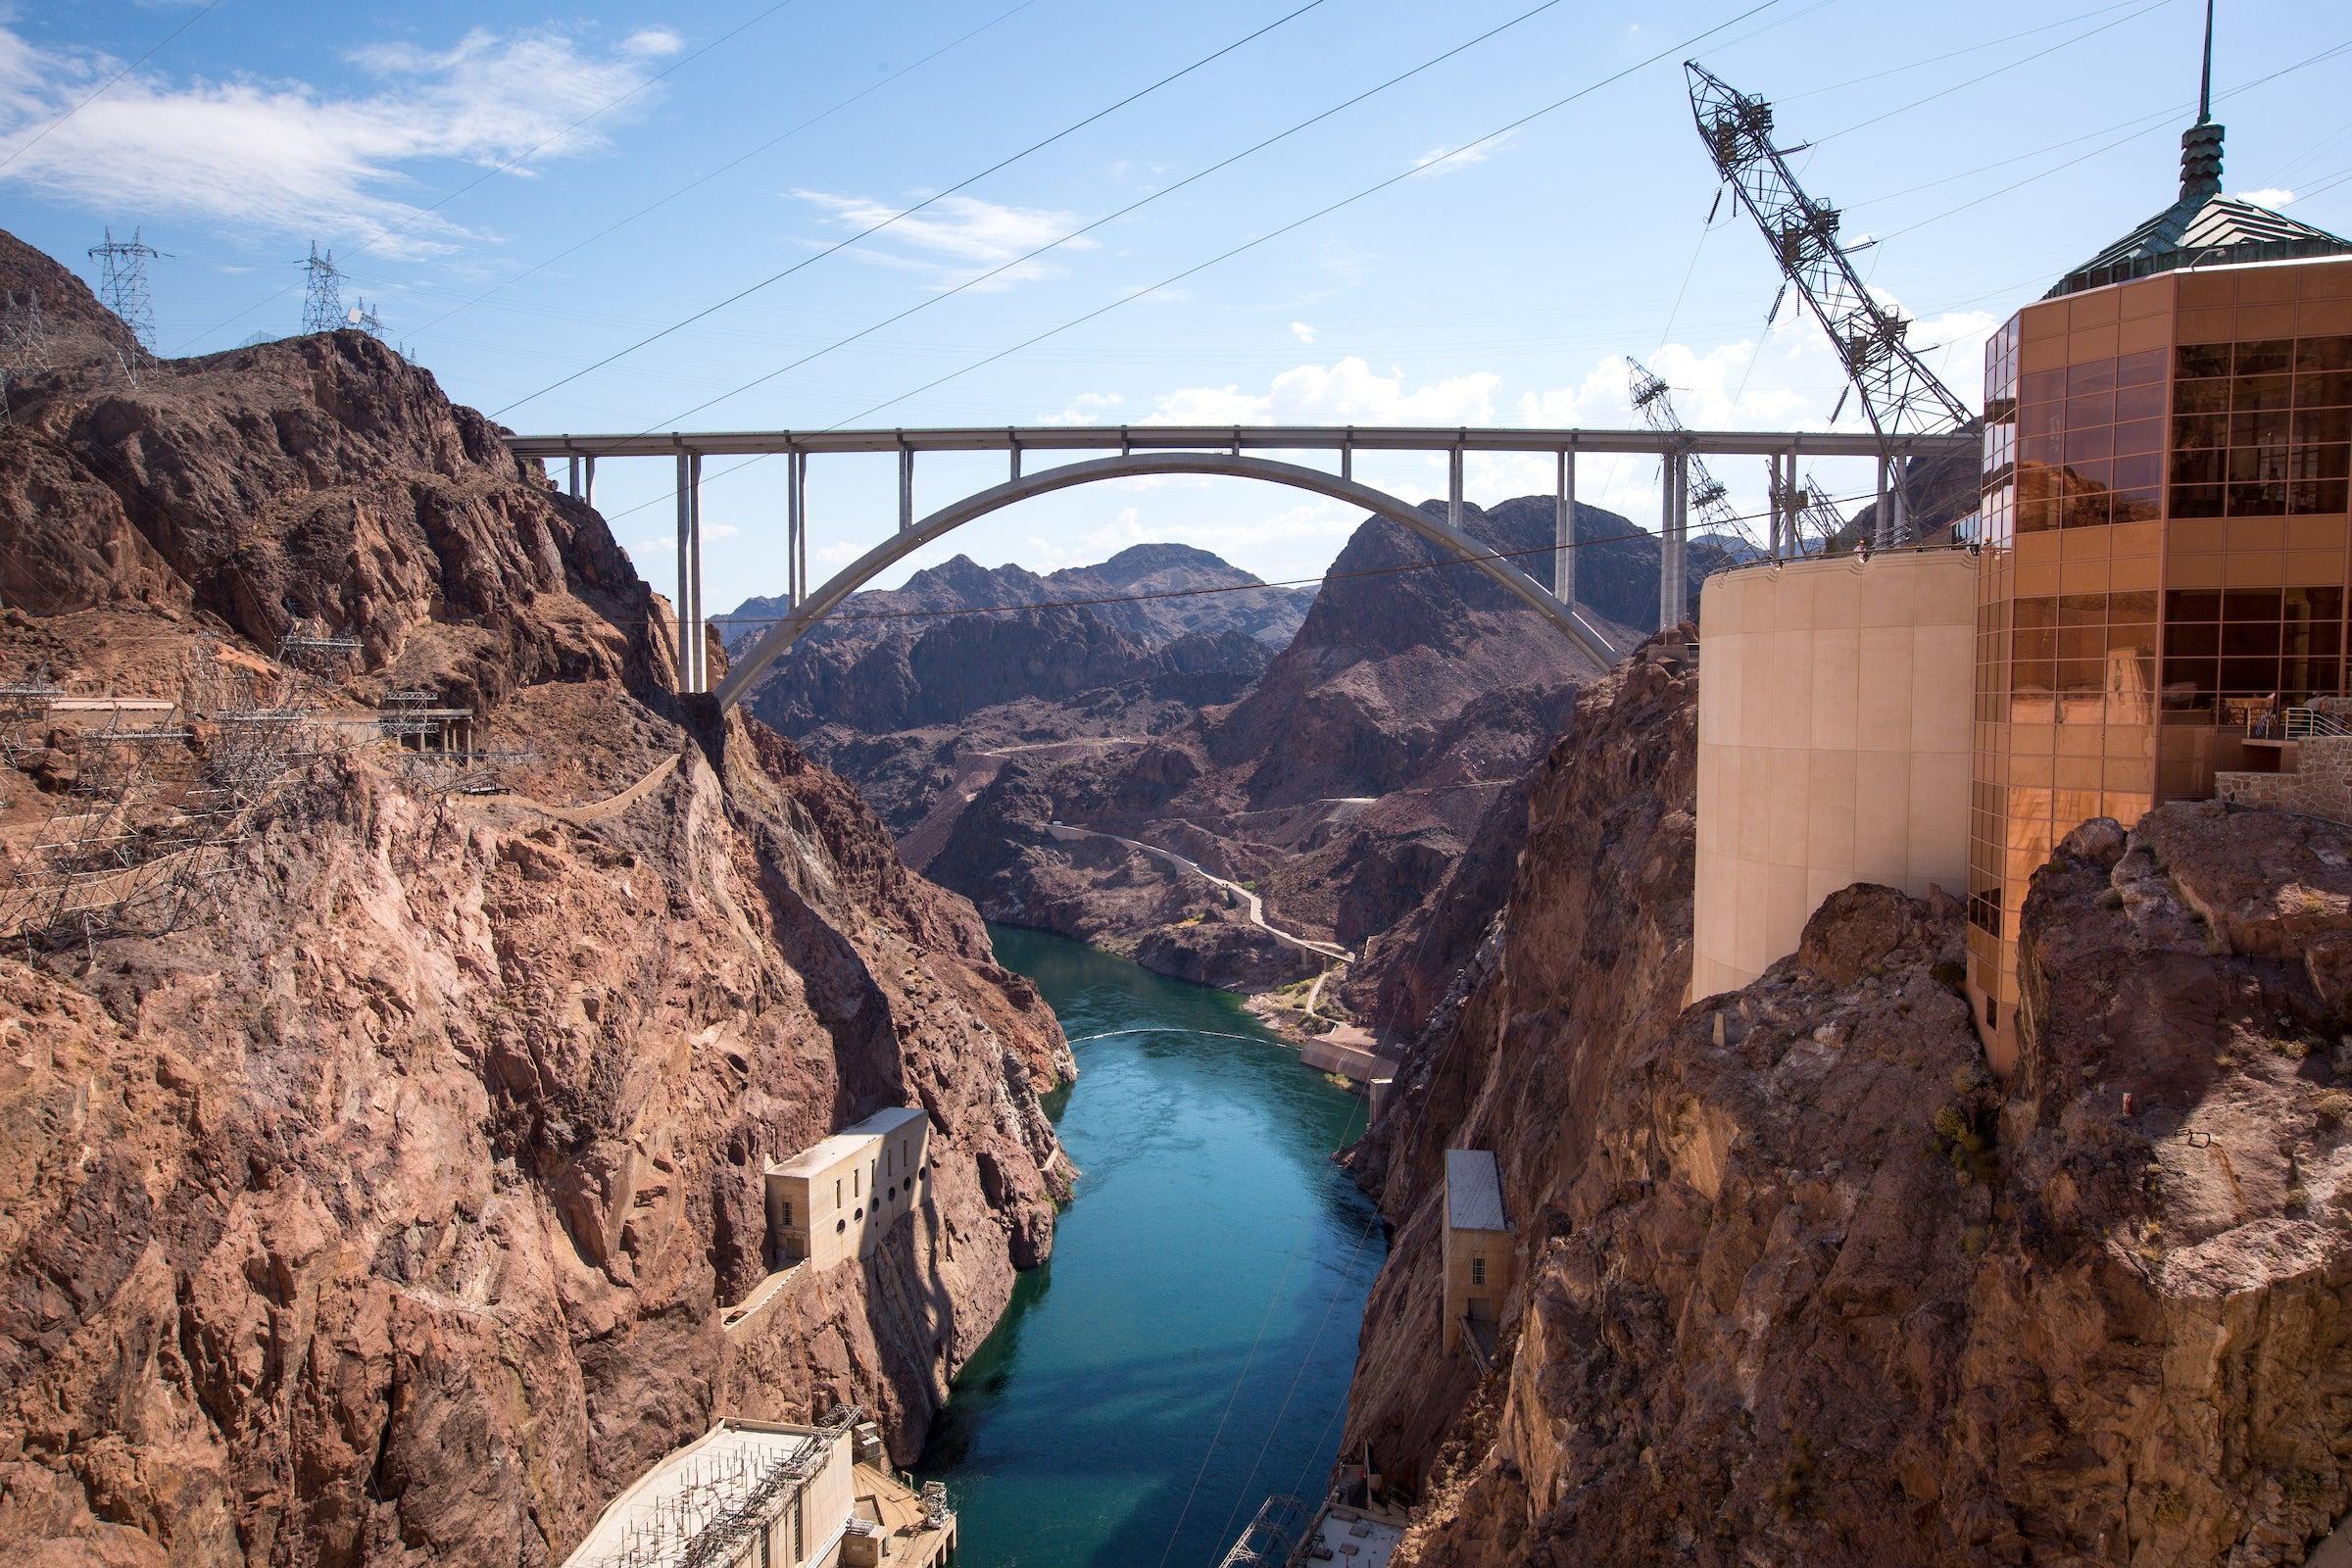 Bridge over Hoover Dam